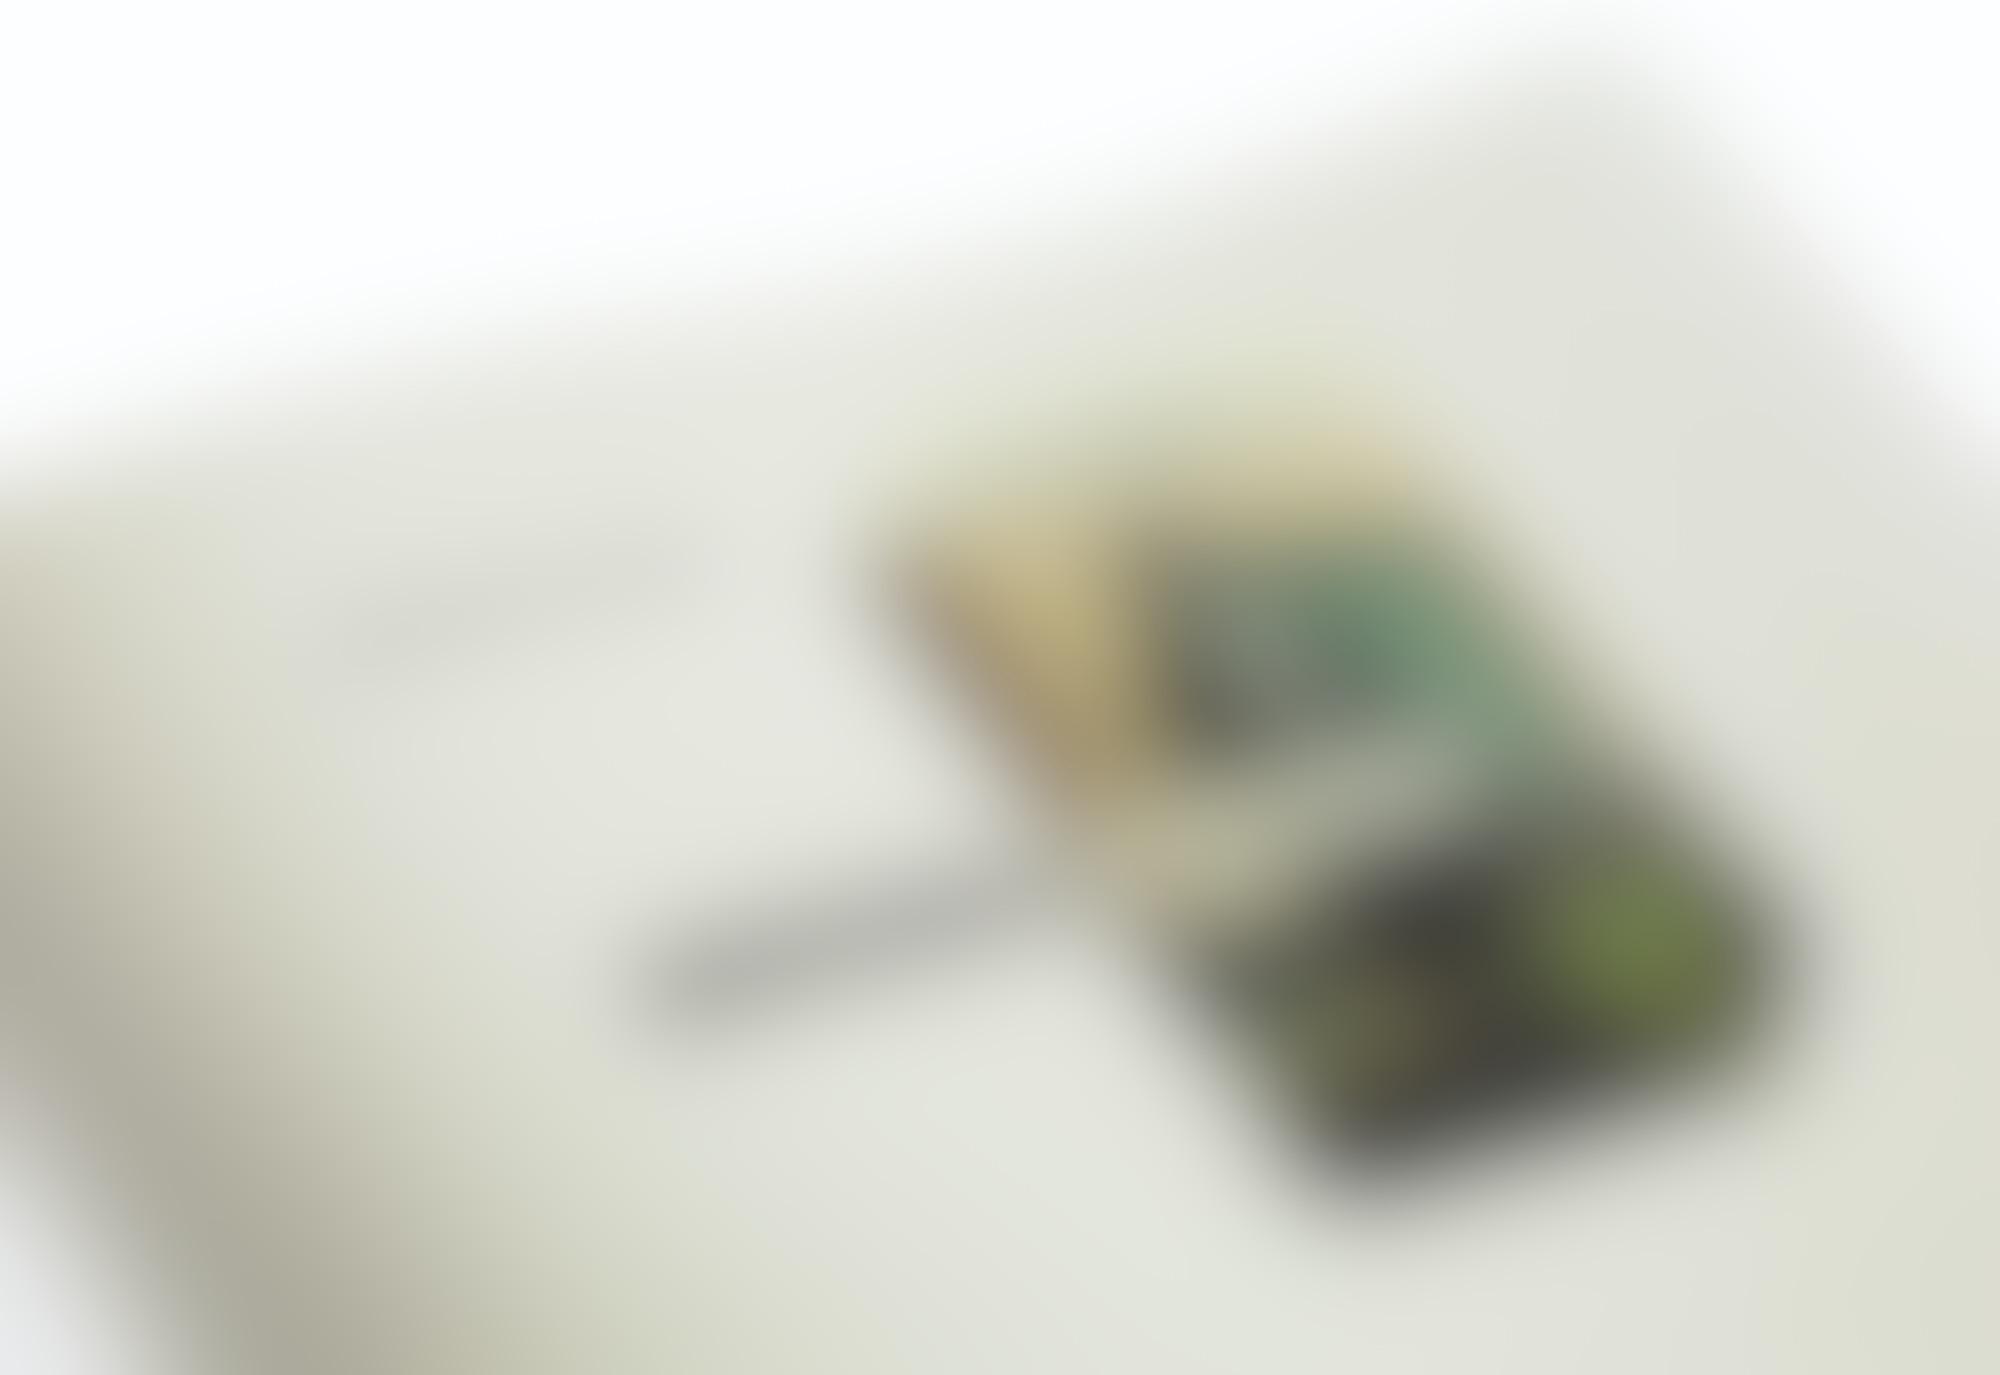 HWLP Book KK Detail autocompressfitresizeixlibphp 1 1 0max h2000max w3 D2000q80s7eaeaaca5f8ae3a340398576543fc6db